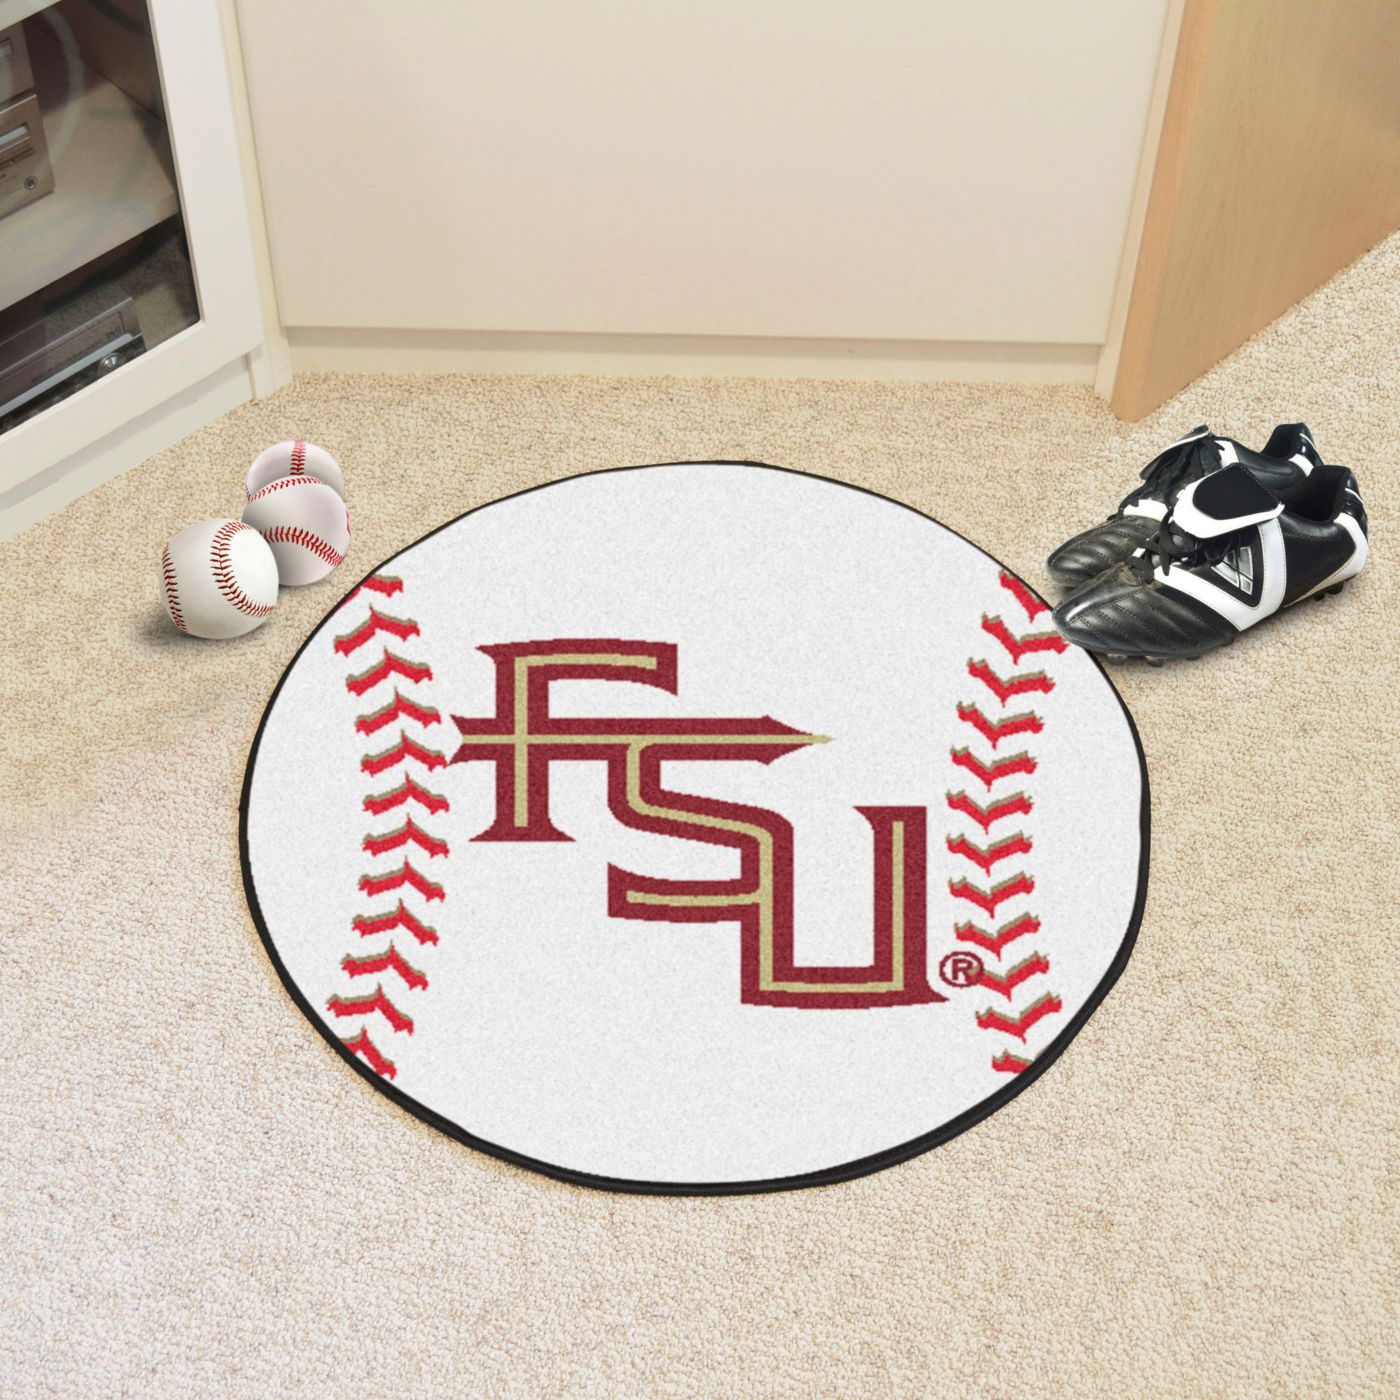 Florida State Seminoles Baseball Mat